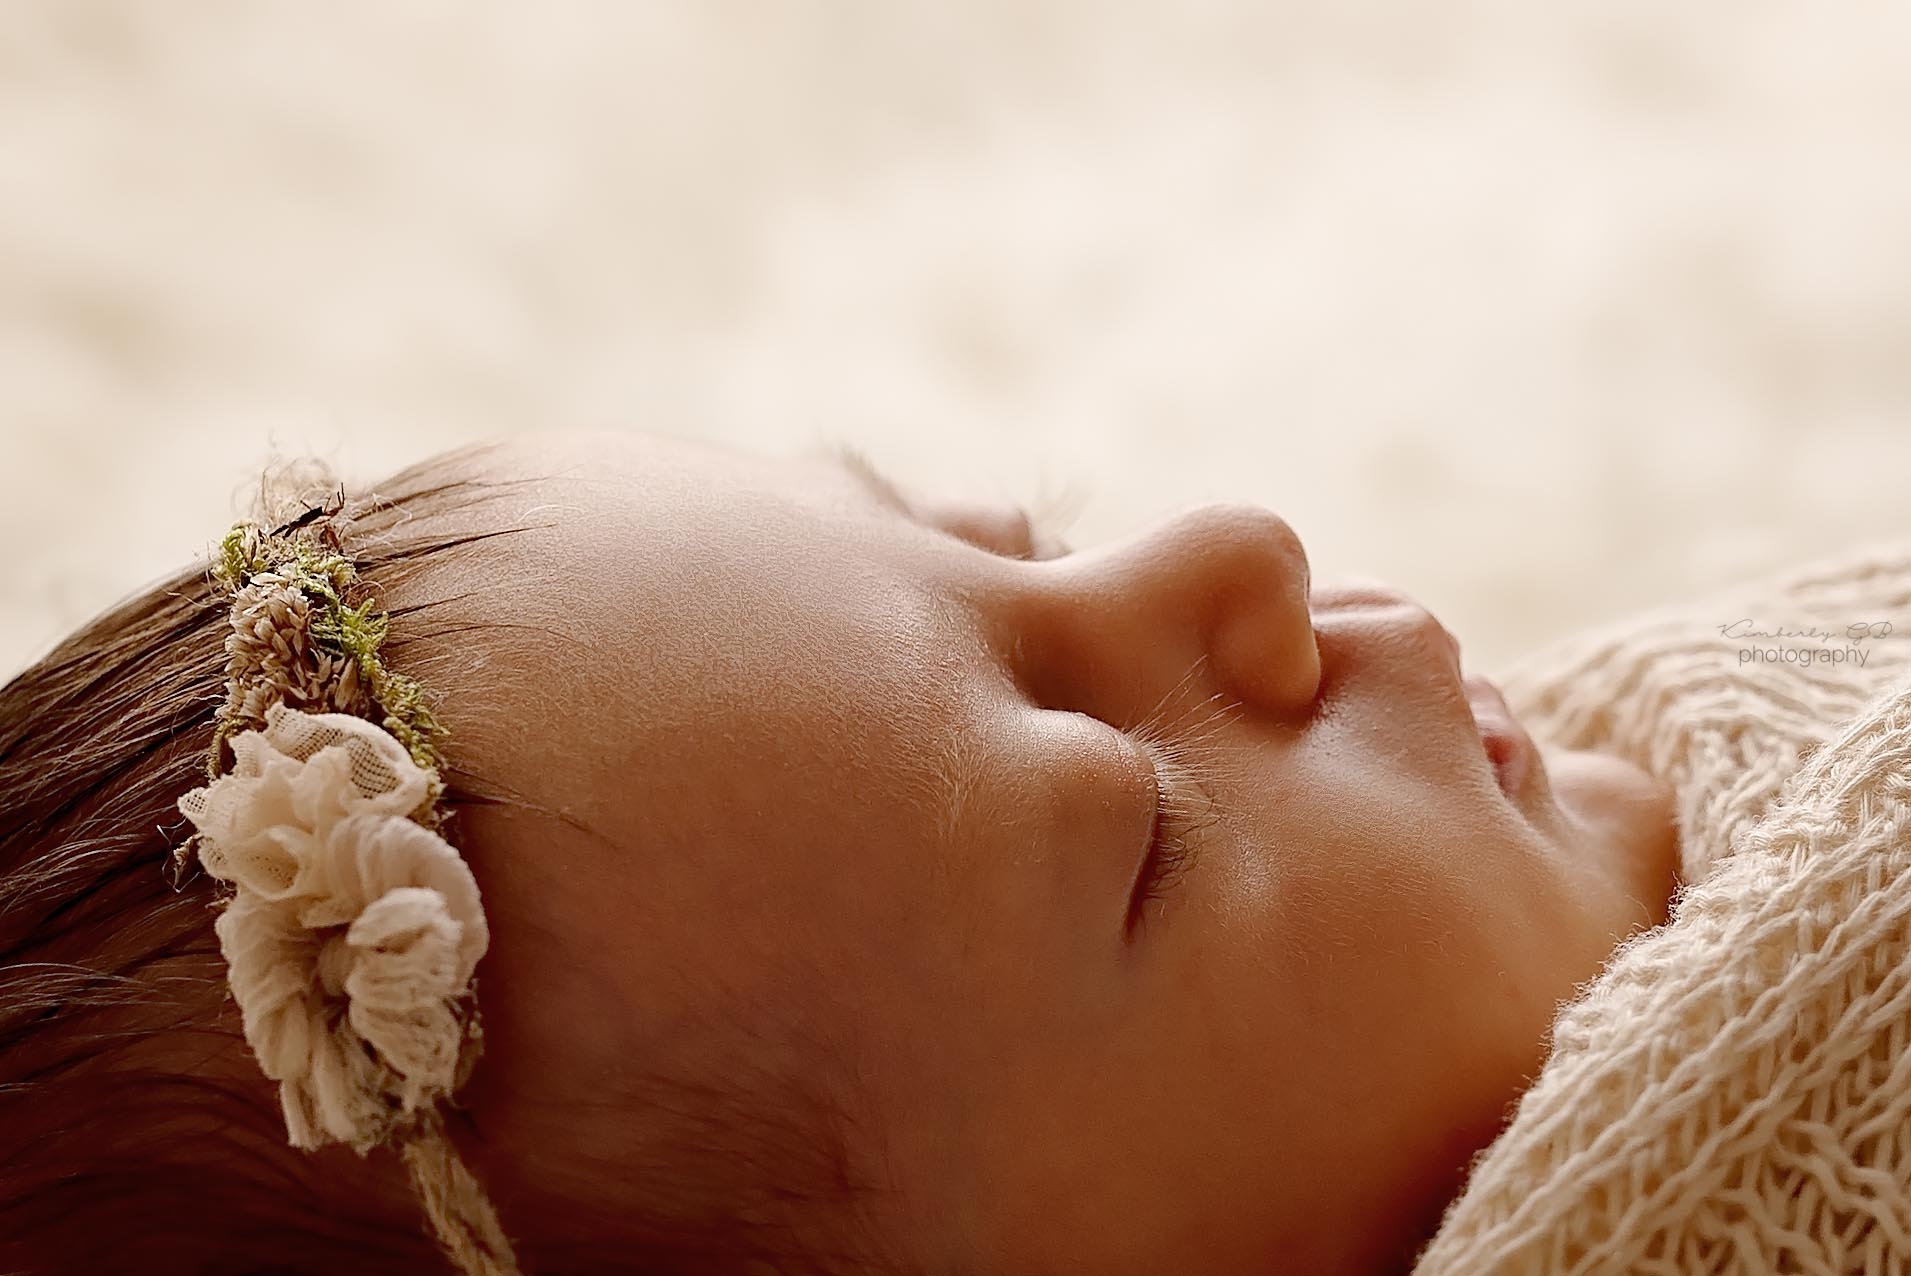 fotografia-de-recien-nacidos-bebes-newborn-en-puerto-rico-kimberly-gb-photography-fotografa-238.jpg